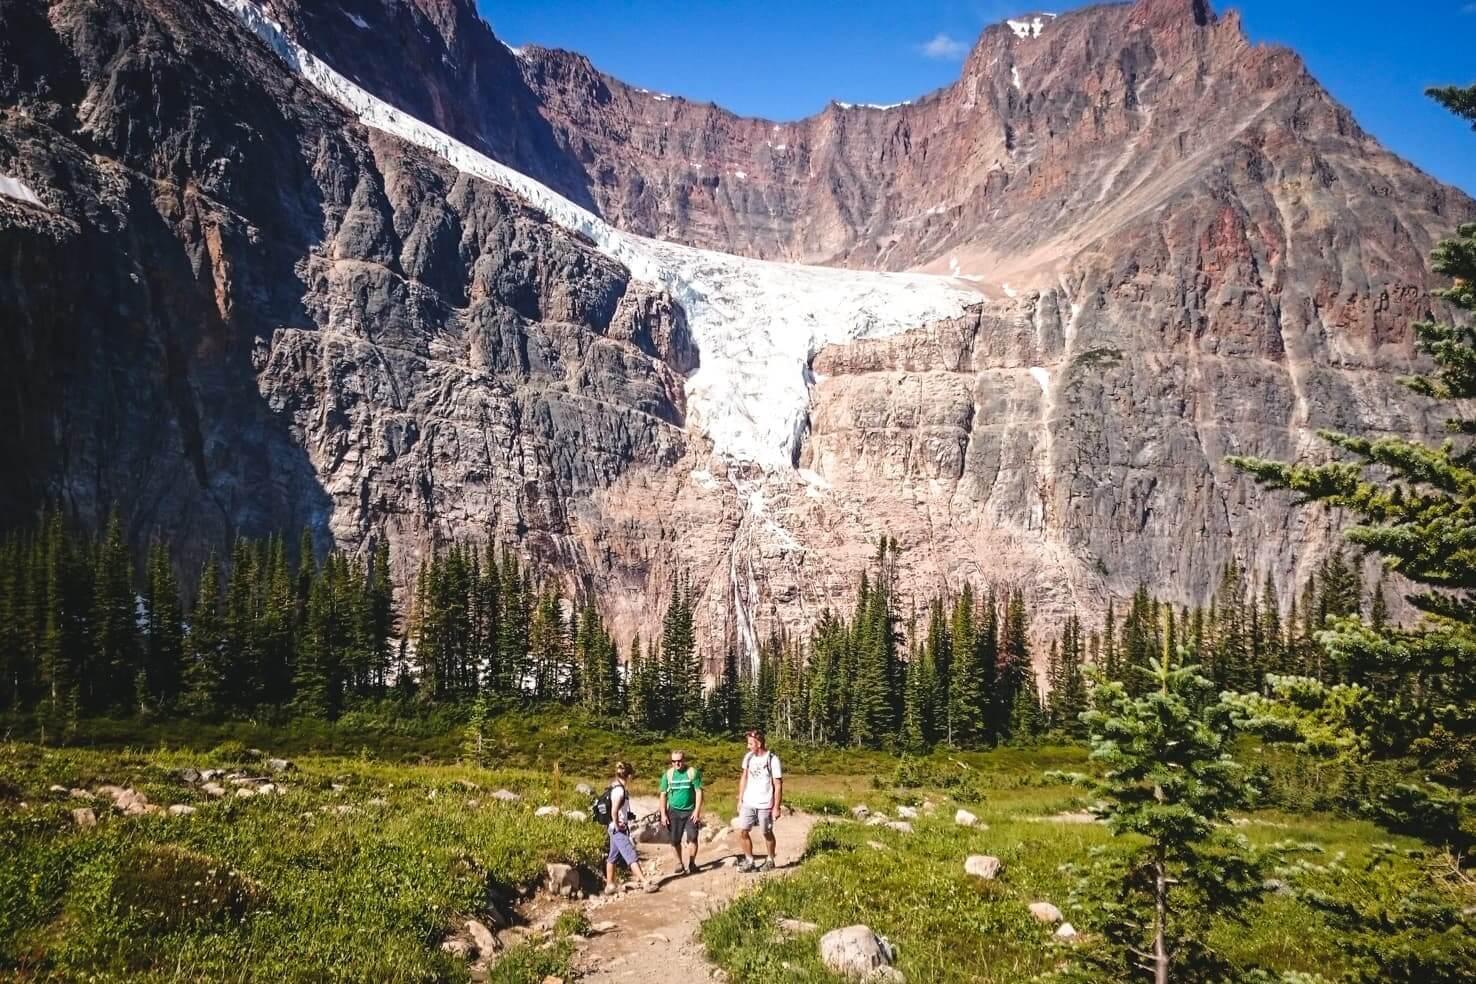 Canadian Rockies road trip itinerary - Mt. Edith Cavell Hike, Jasper National Park